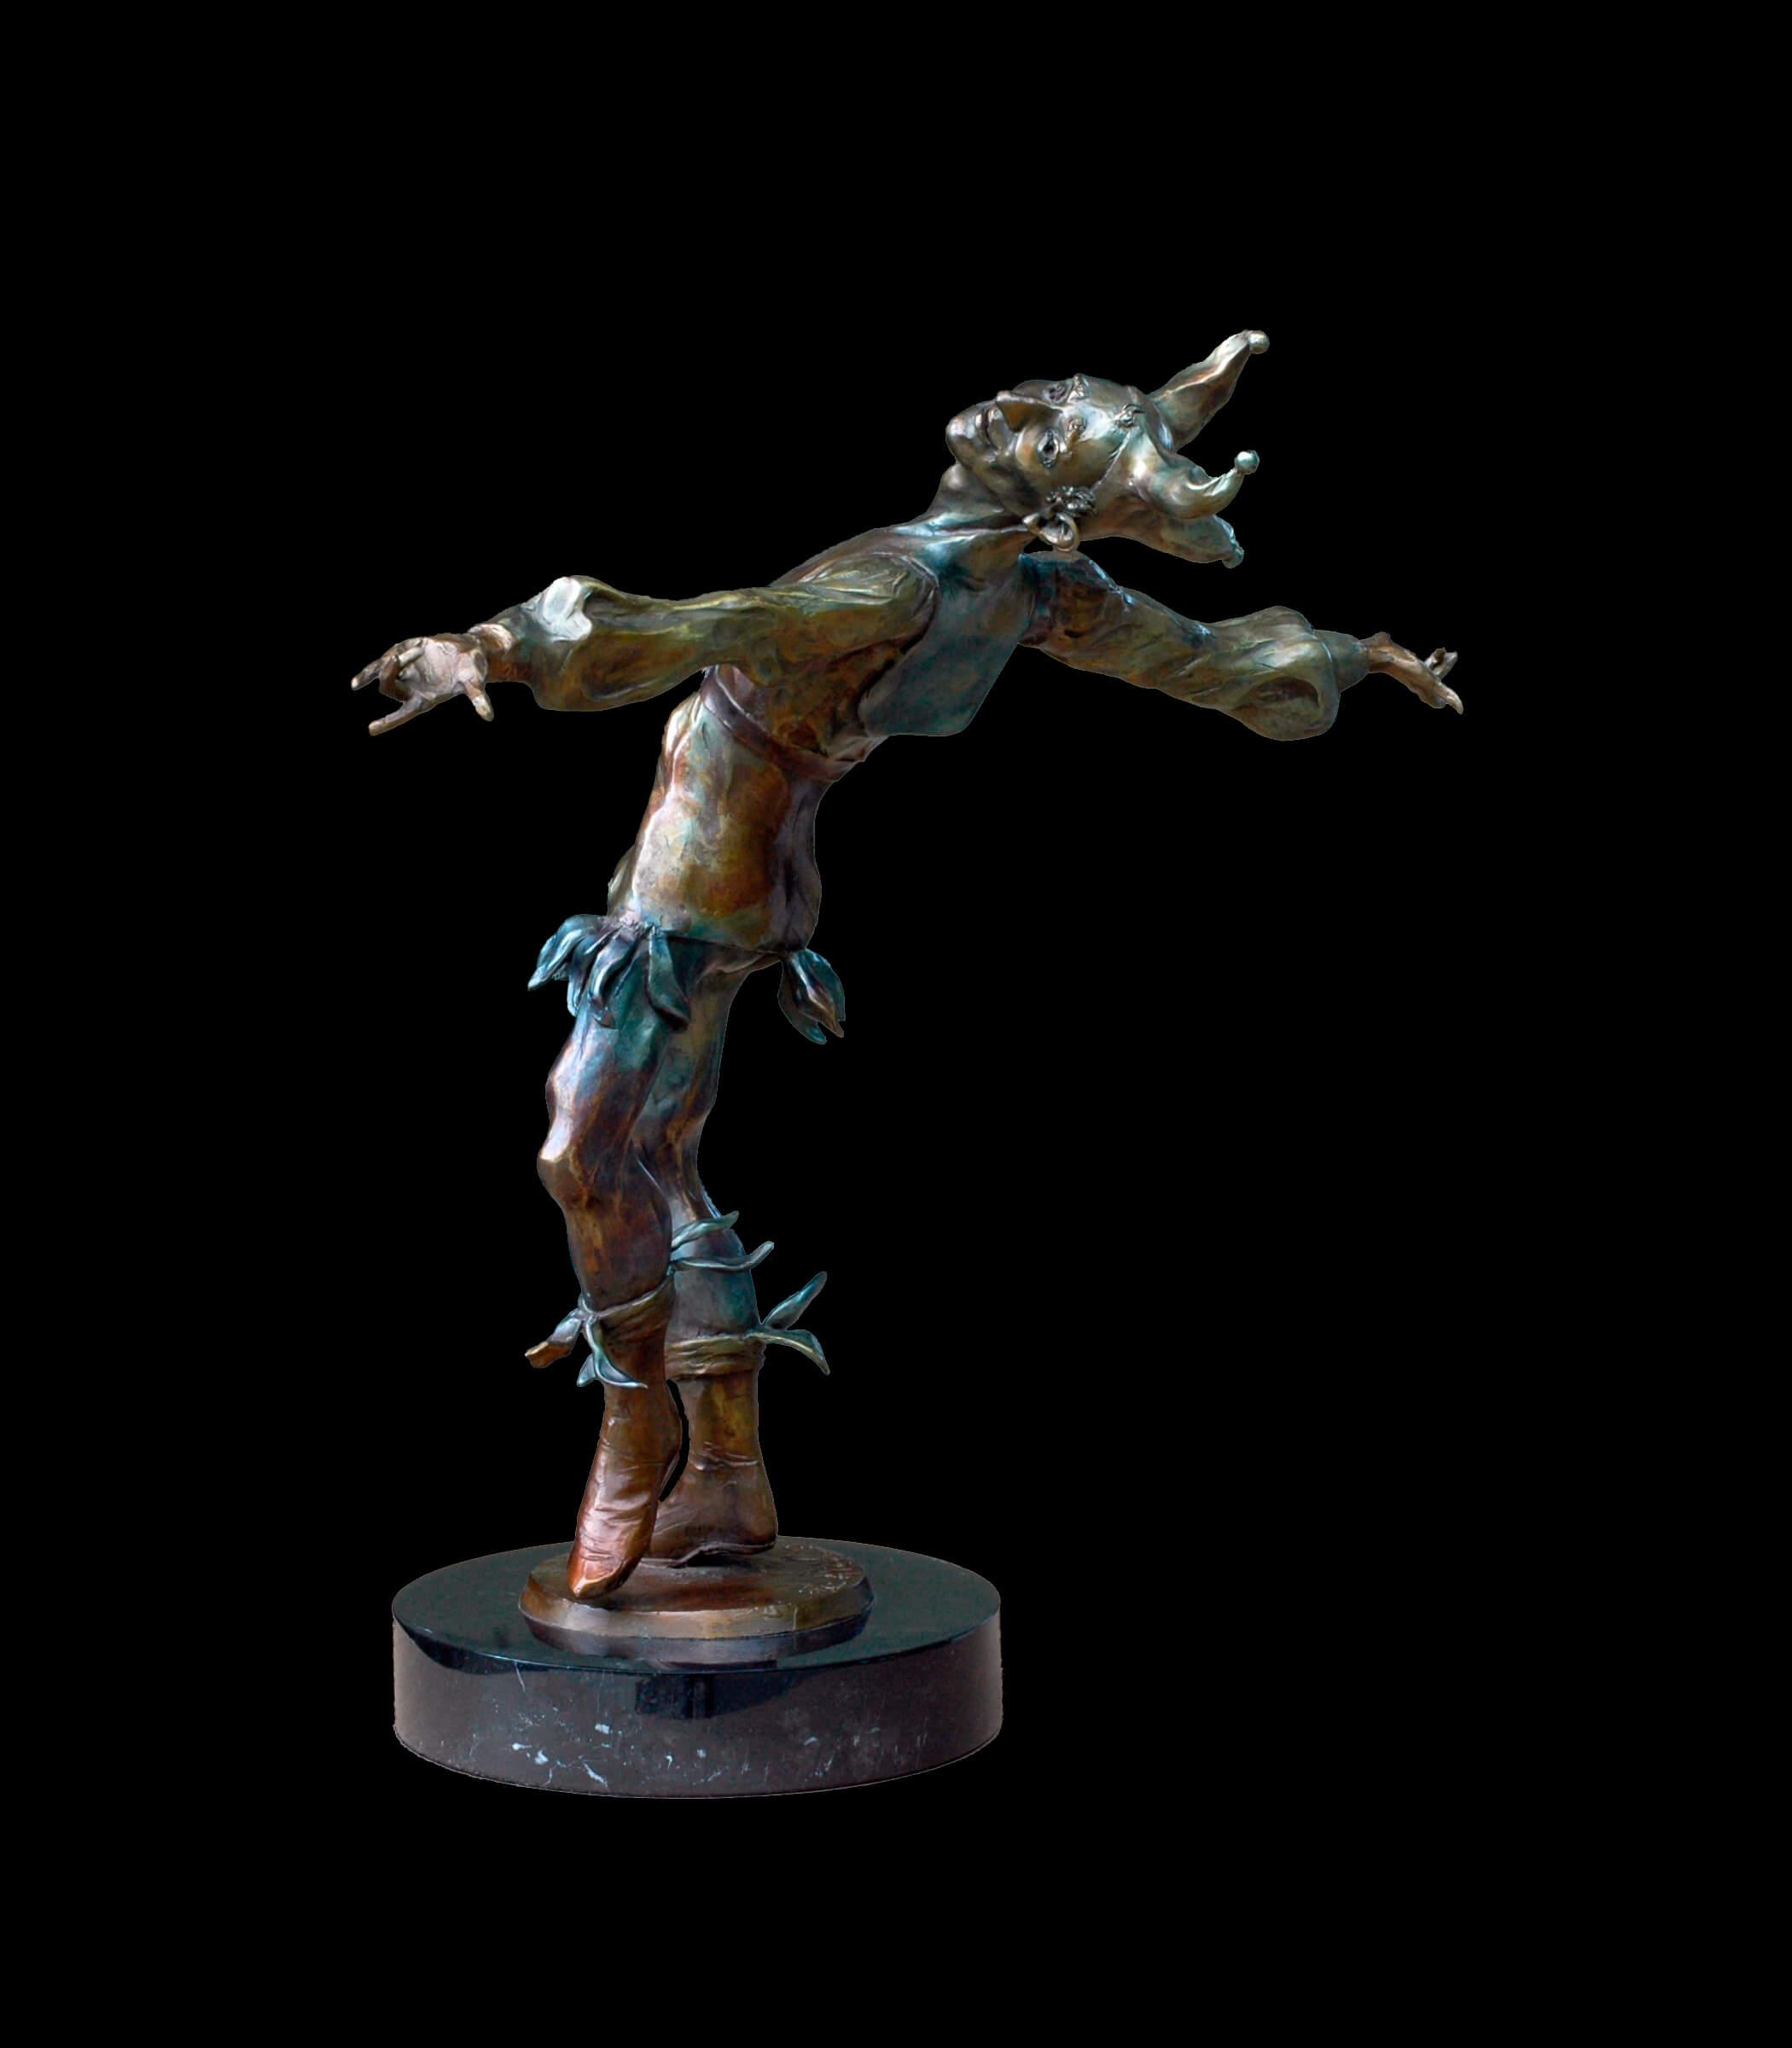 Jester a figurative bronze jester sculpture by sculptor Andrew DeVries